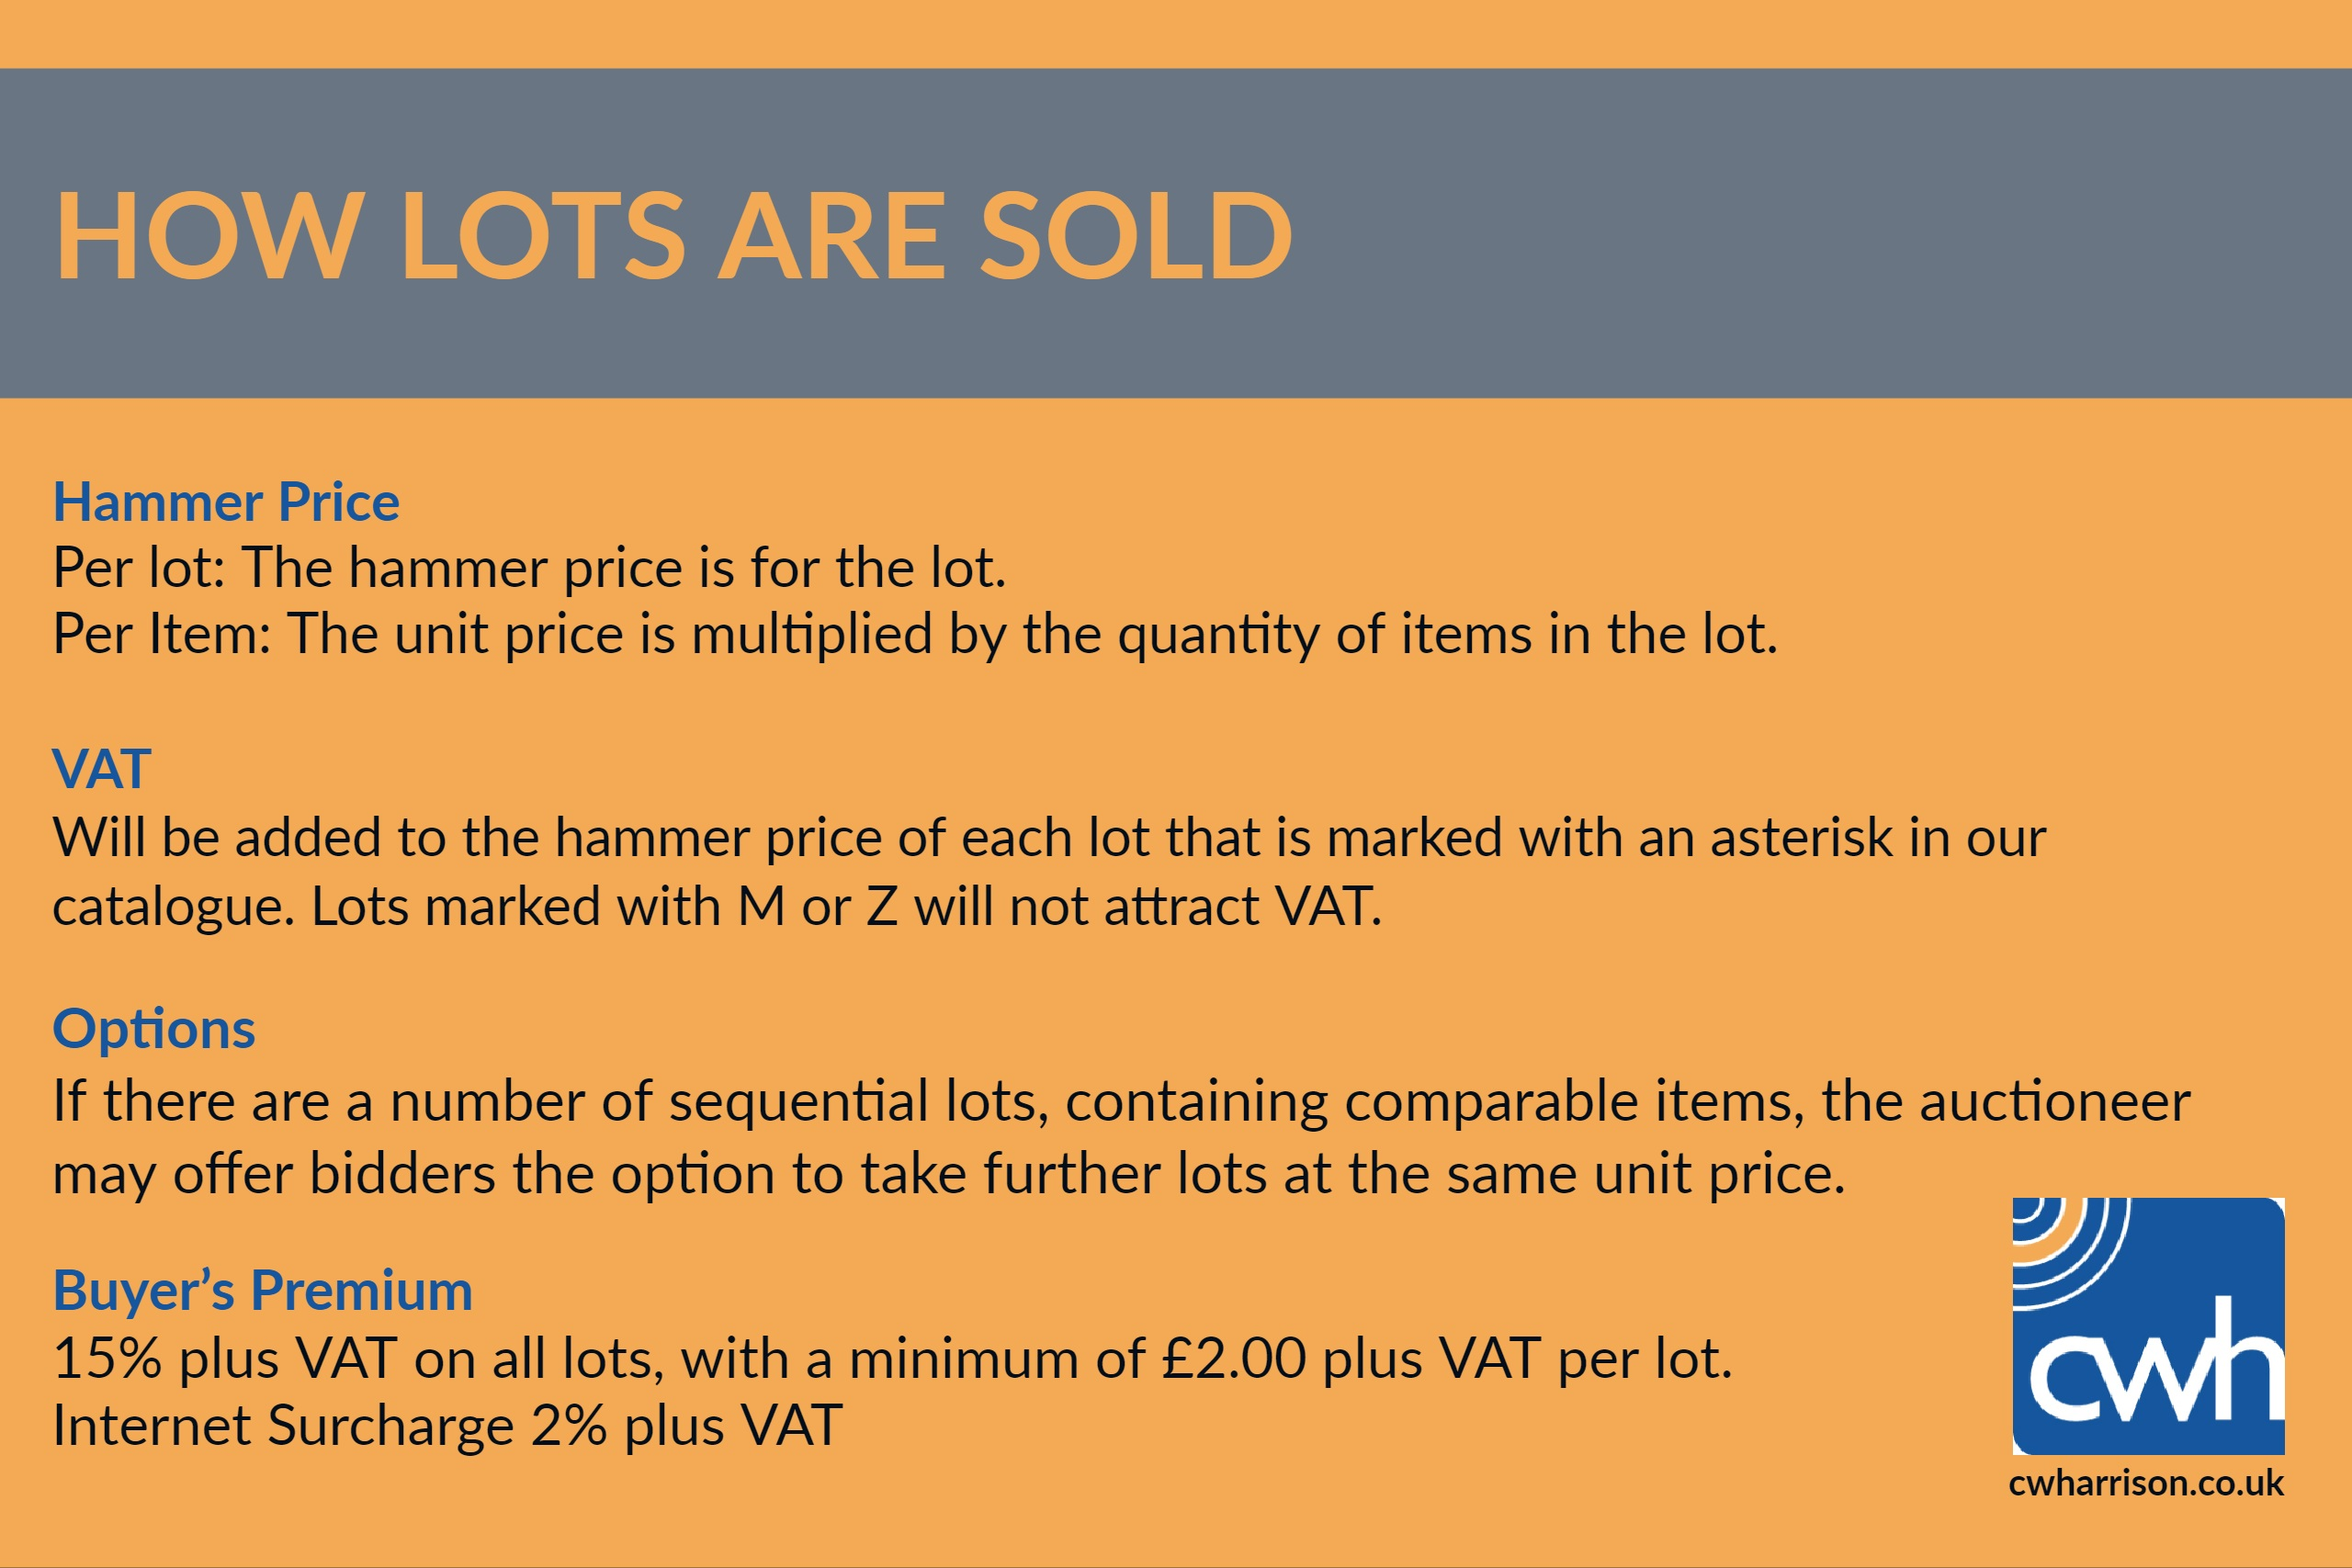 Lot 1B - Saleroom Announcement